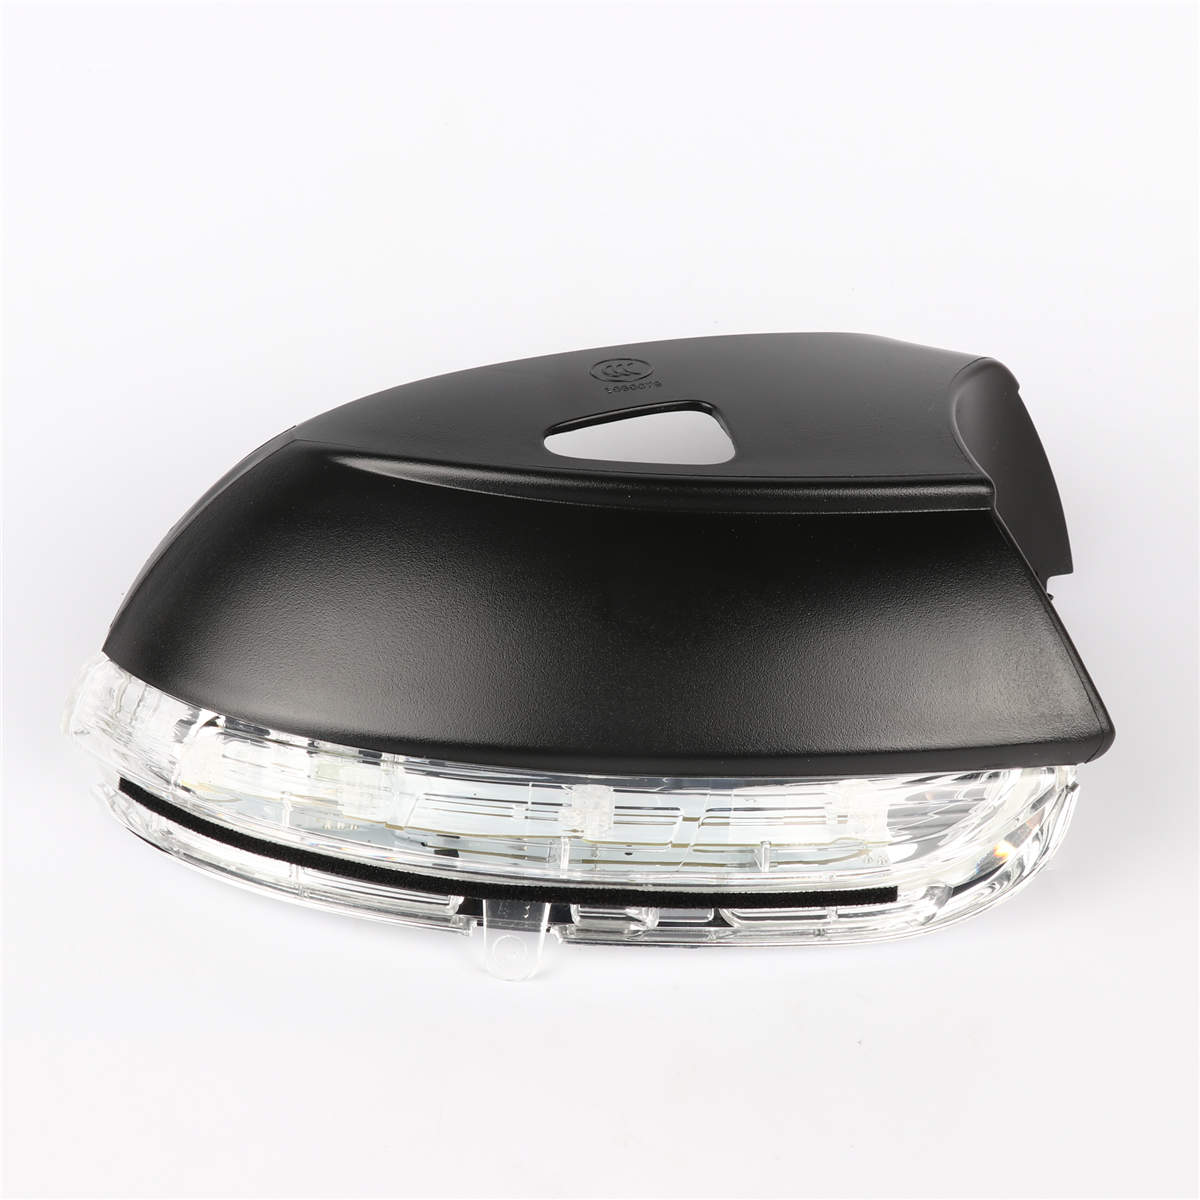 1Pcs OEM Left Side Mirror Side Turn Signal Light with Hole For VW Passat B7/Passat CC/Passat CC NF 35D 949 101 passat b3 светодиодные фары купить